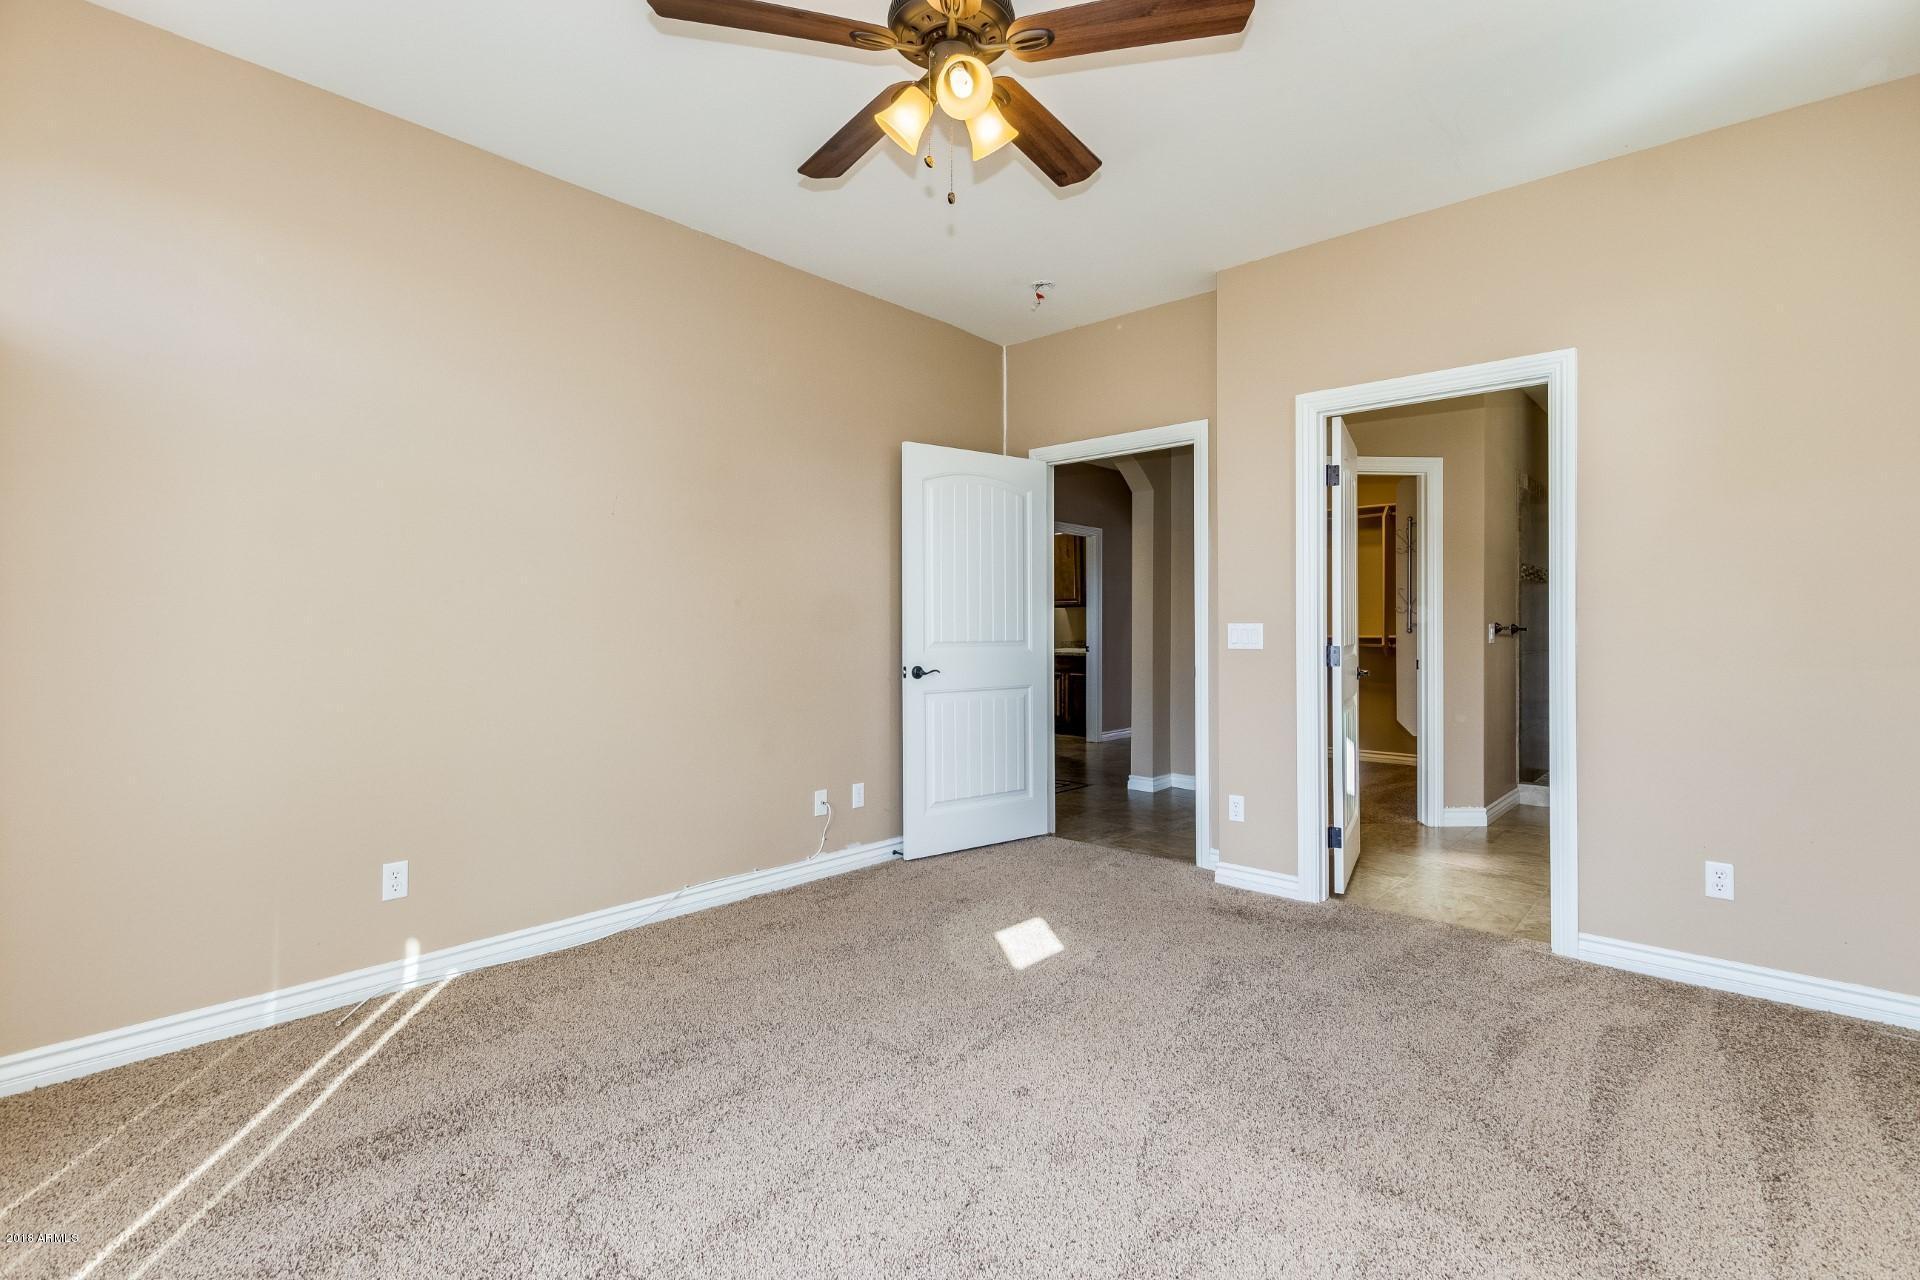 2449 N EASTWOOD Way Mesa, AZ 85215 - MLS #: 5856267